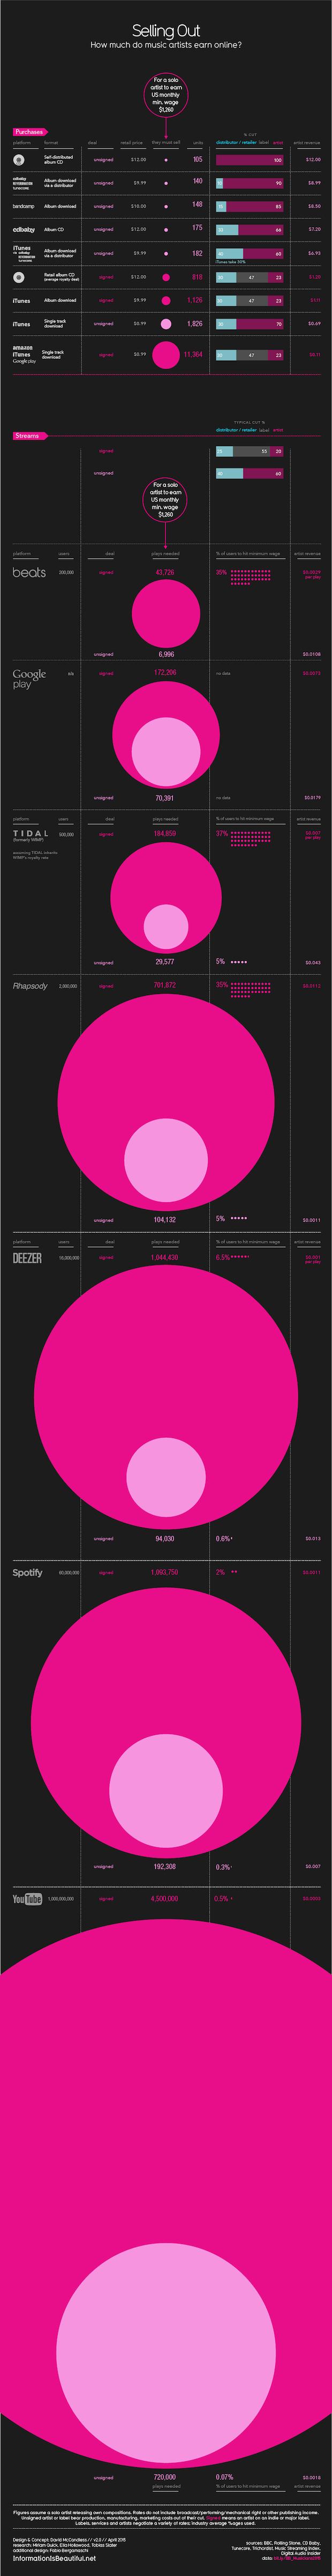 Infographic money musicians